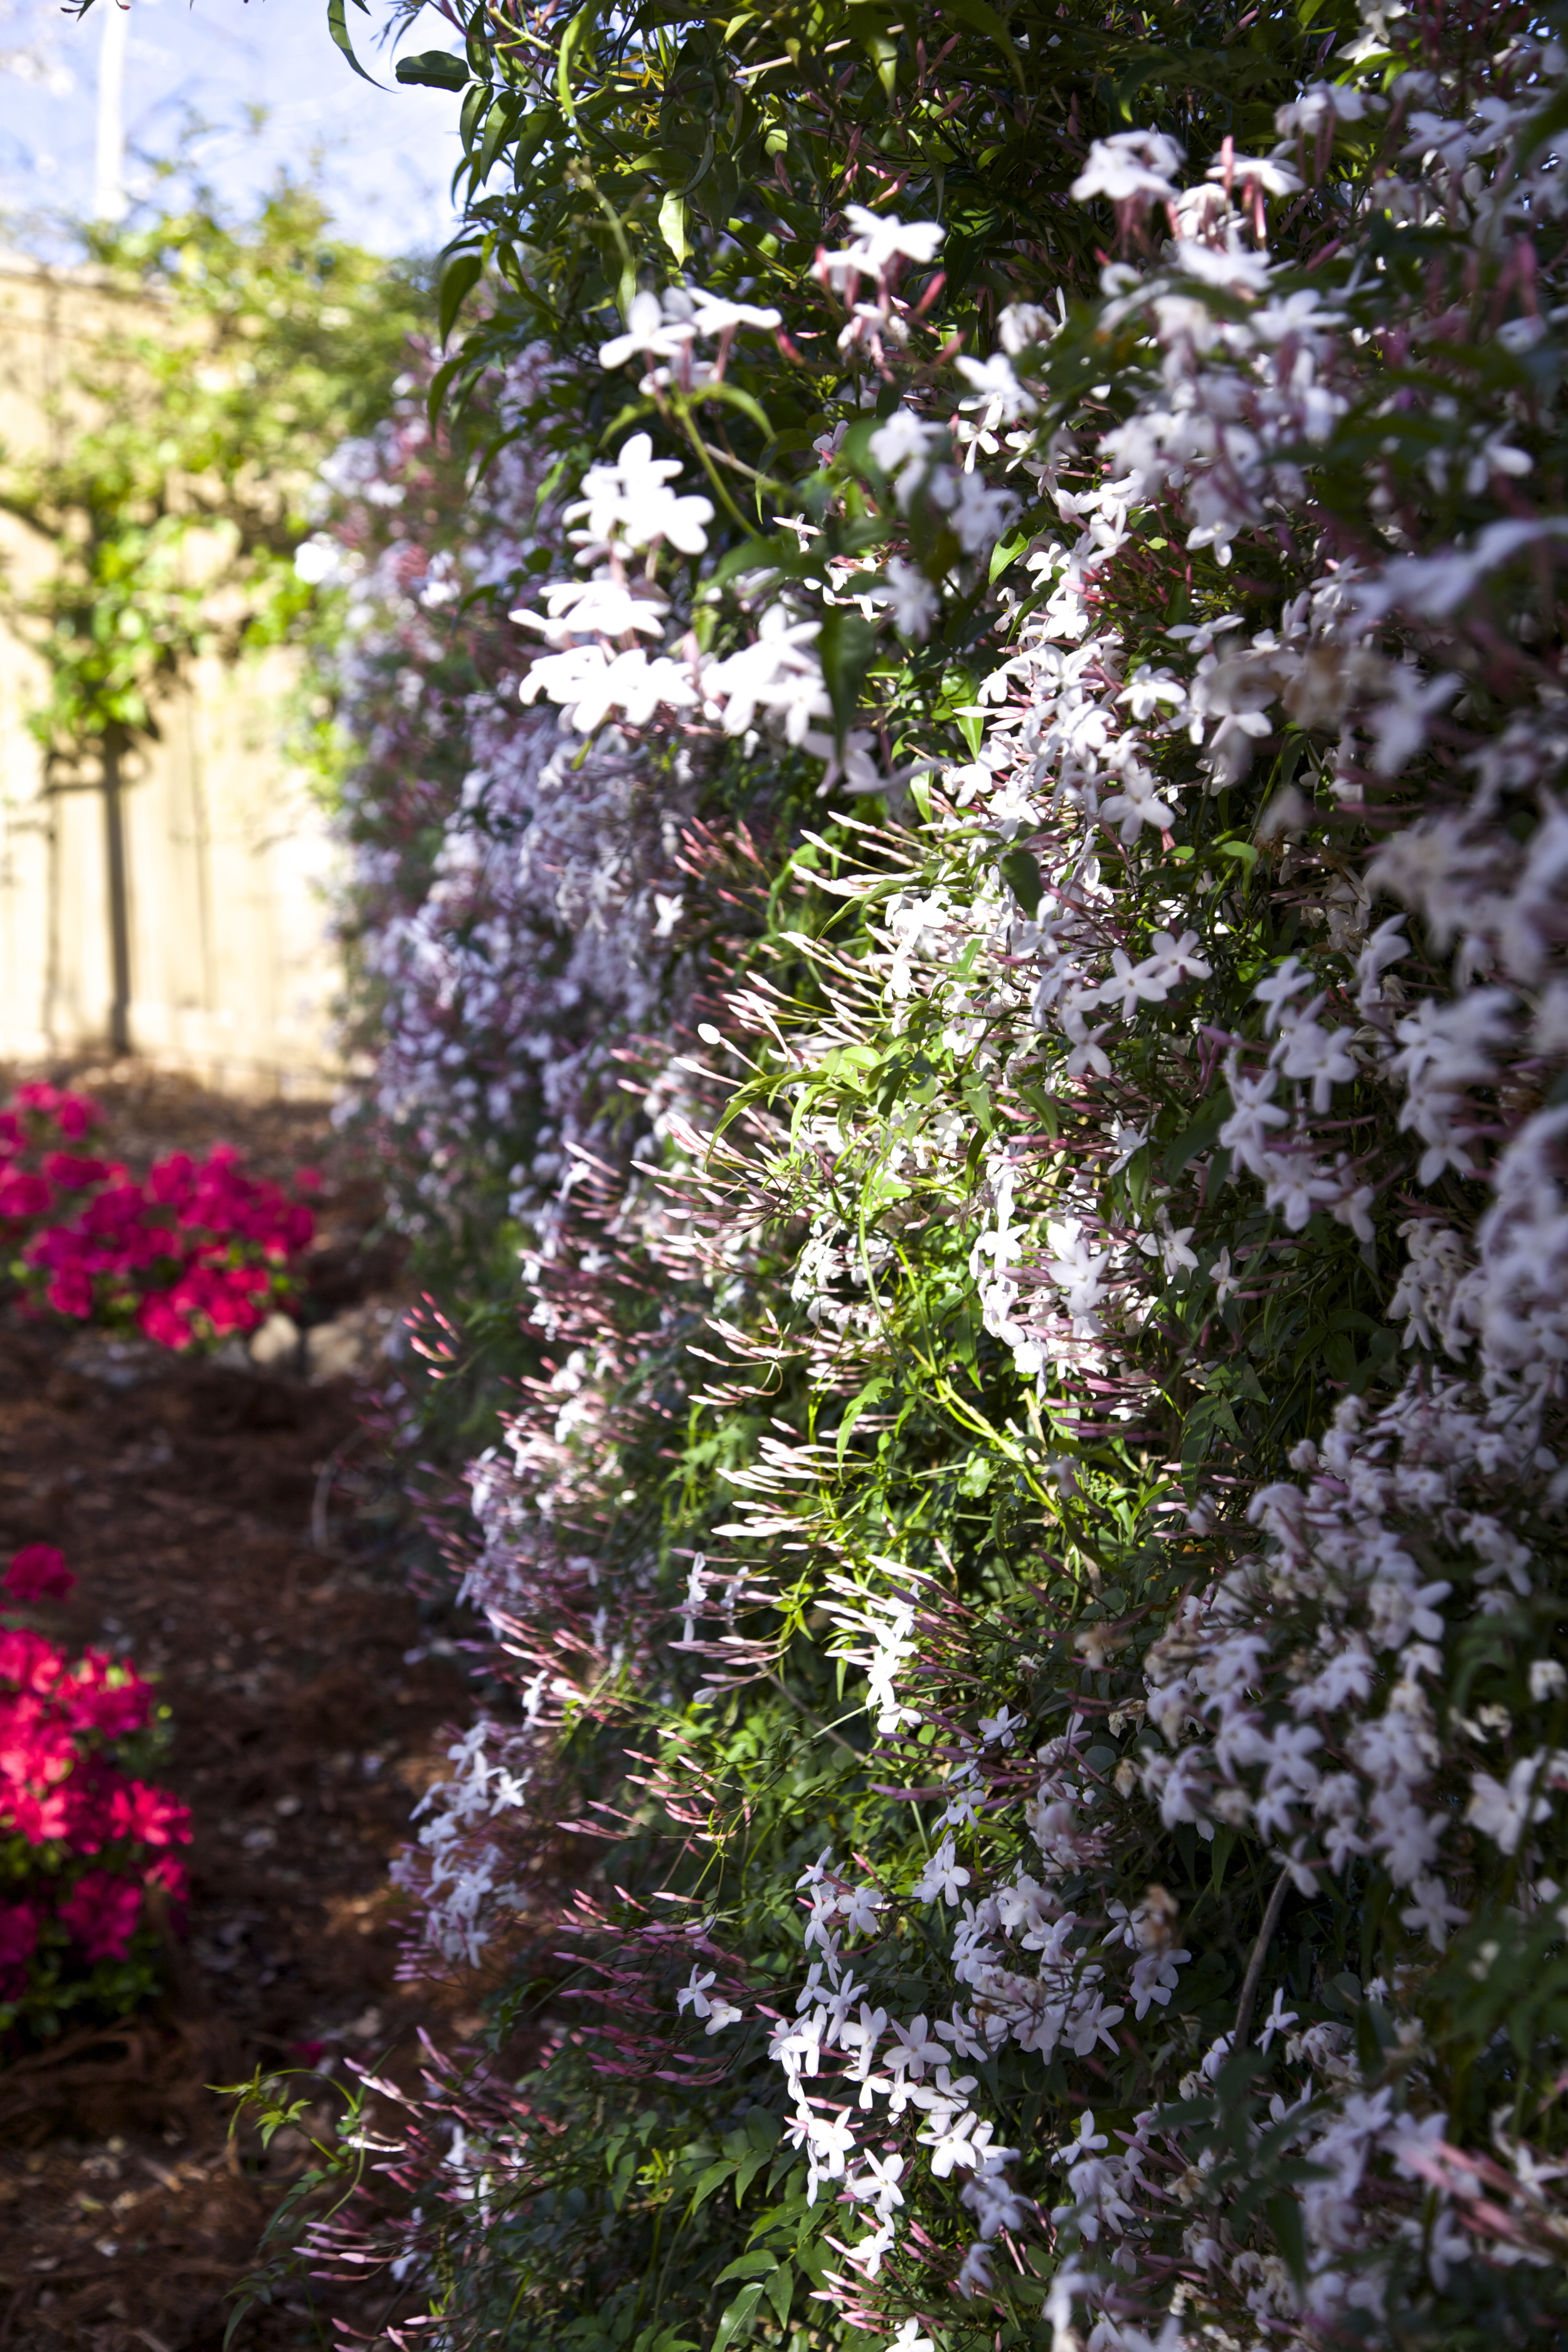 Hillside jasmine scents the air